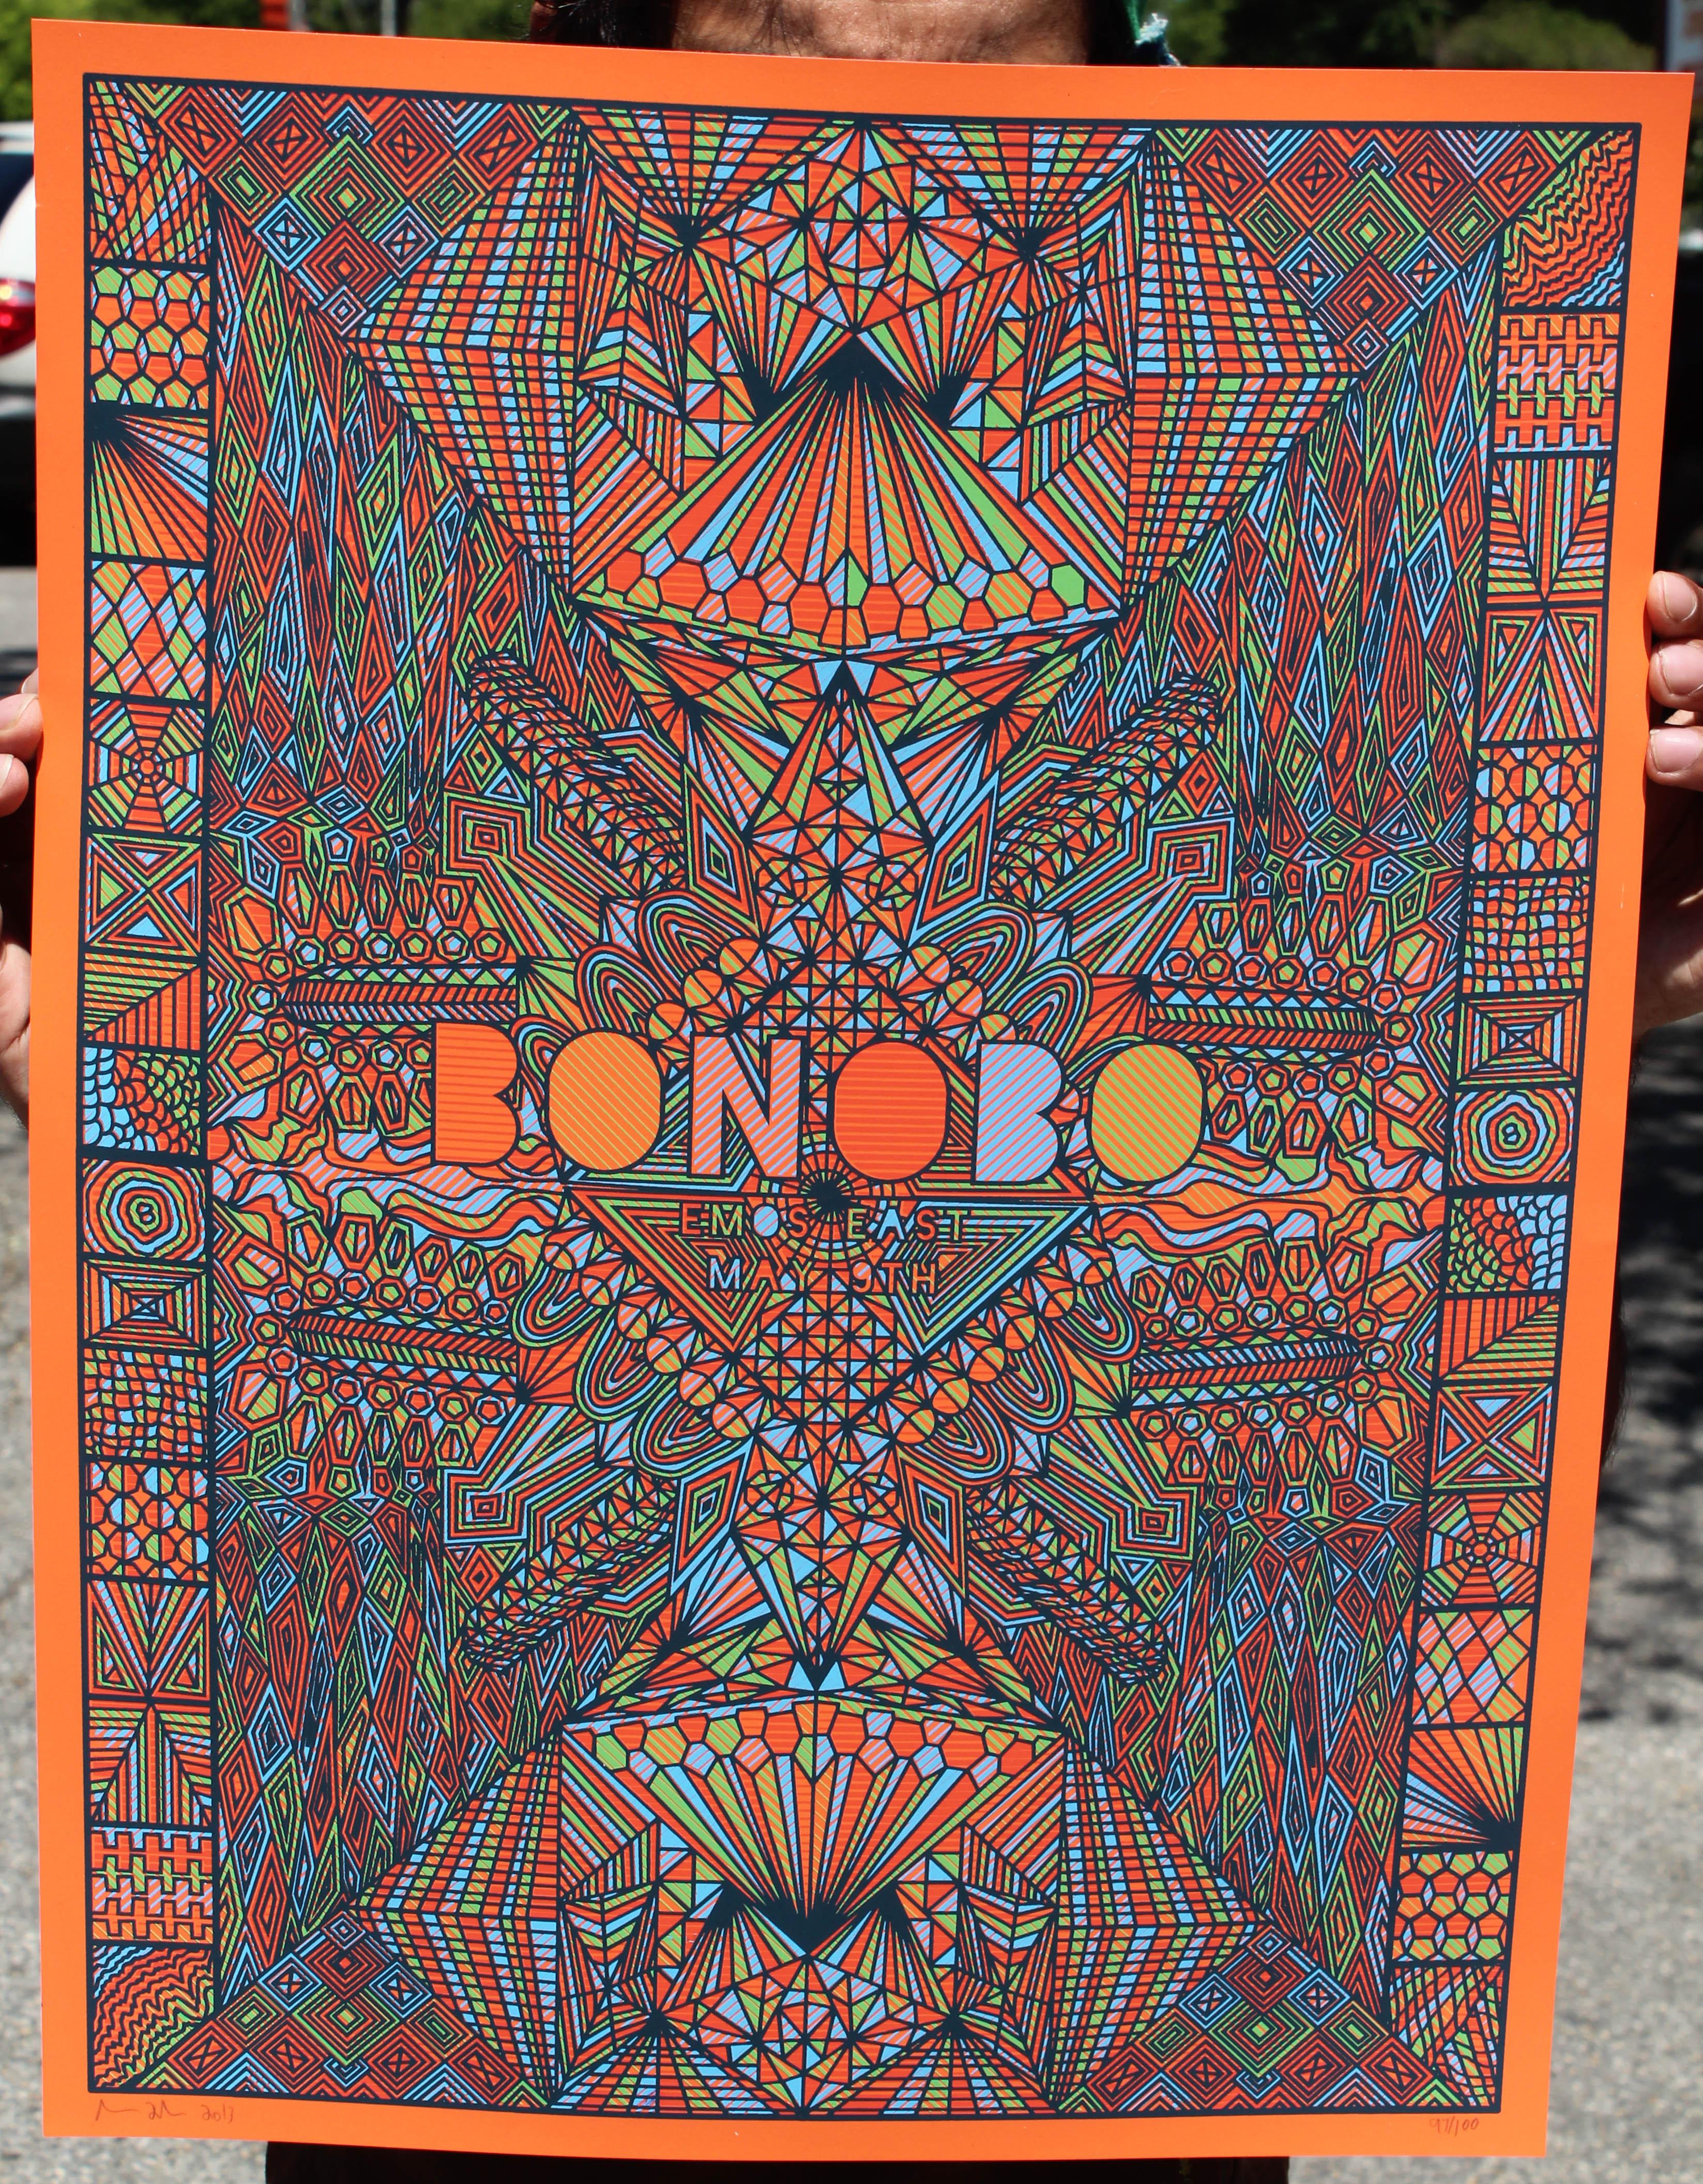 Color printing austin - Fuchs Bonobo Austin Tx 2013